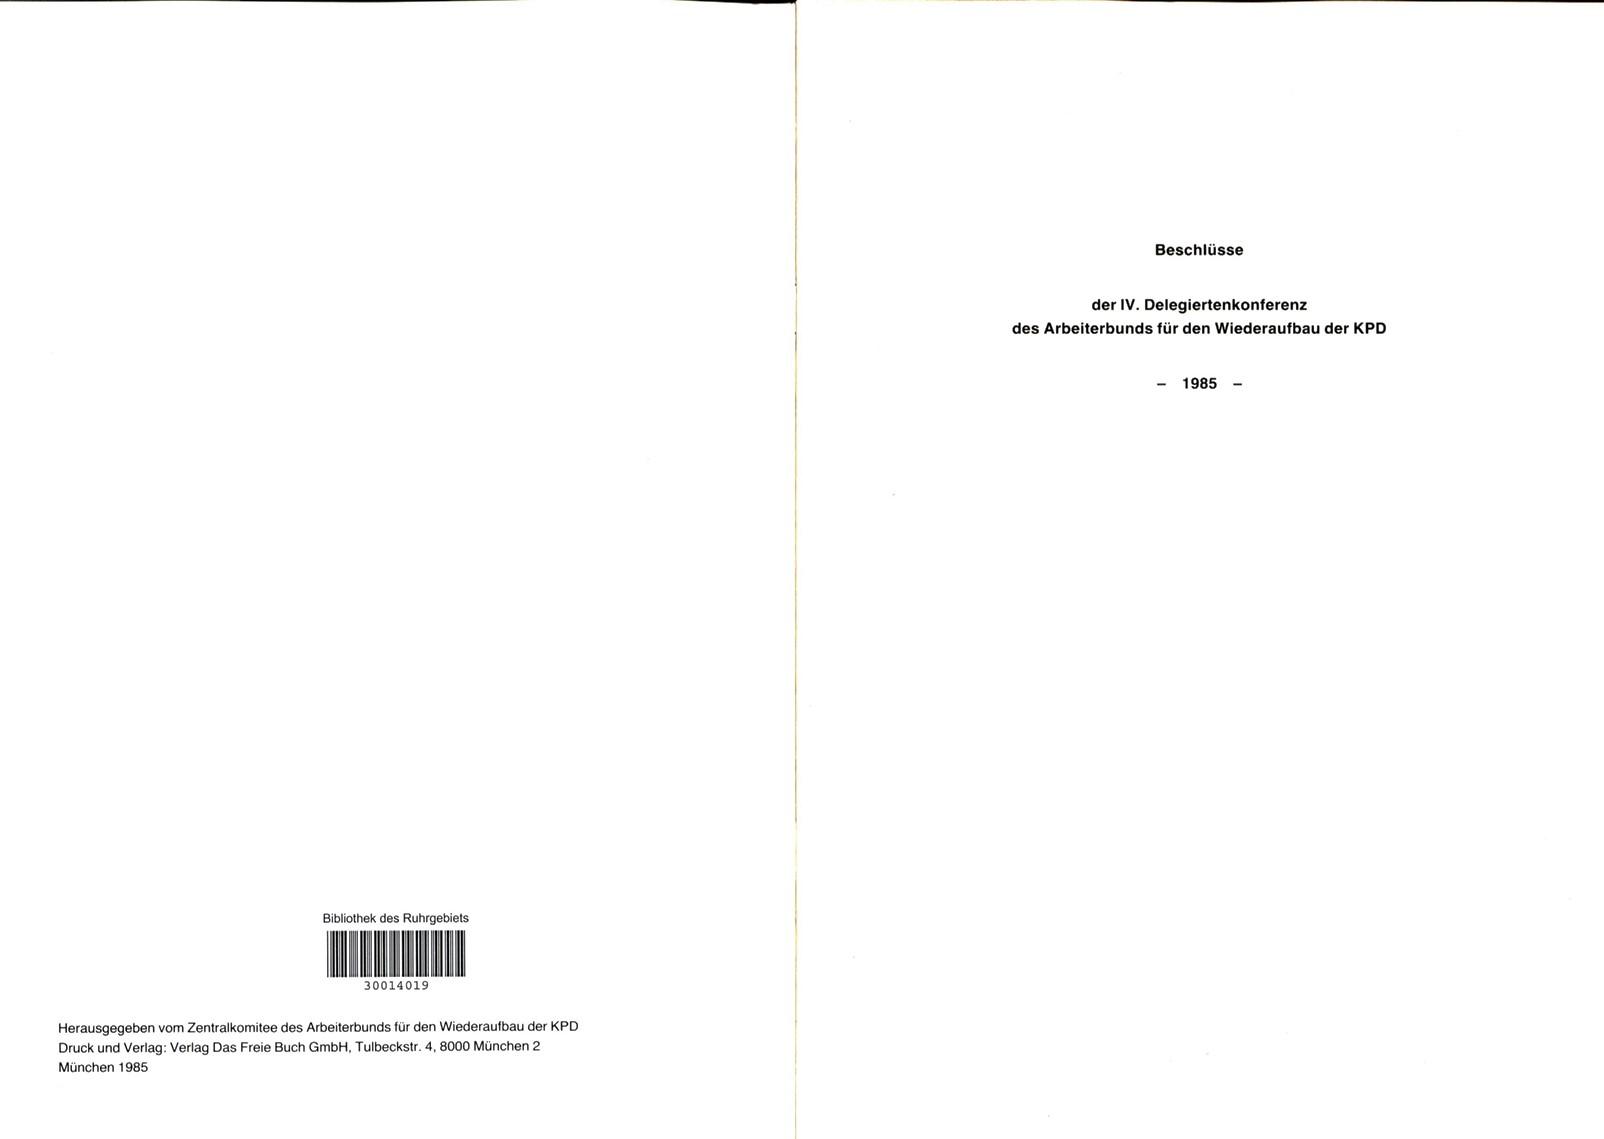 ABG_1985_Beschluesse_IV_Delegiertenkonferenz_01